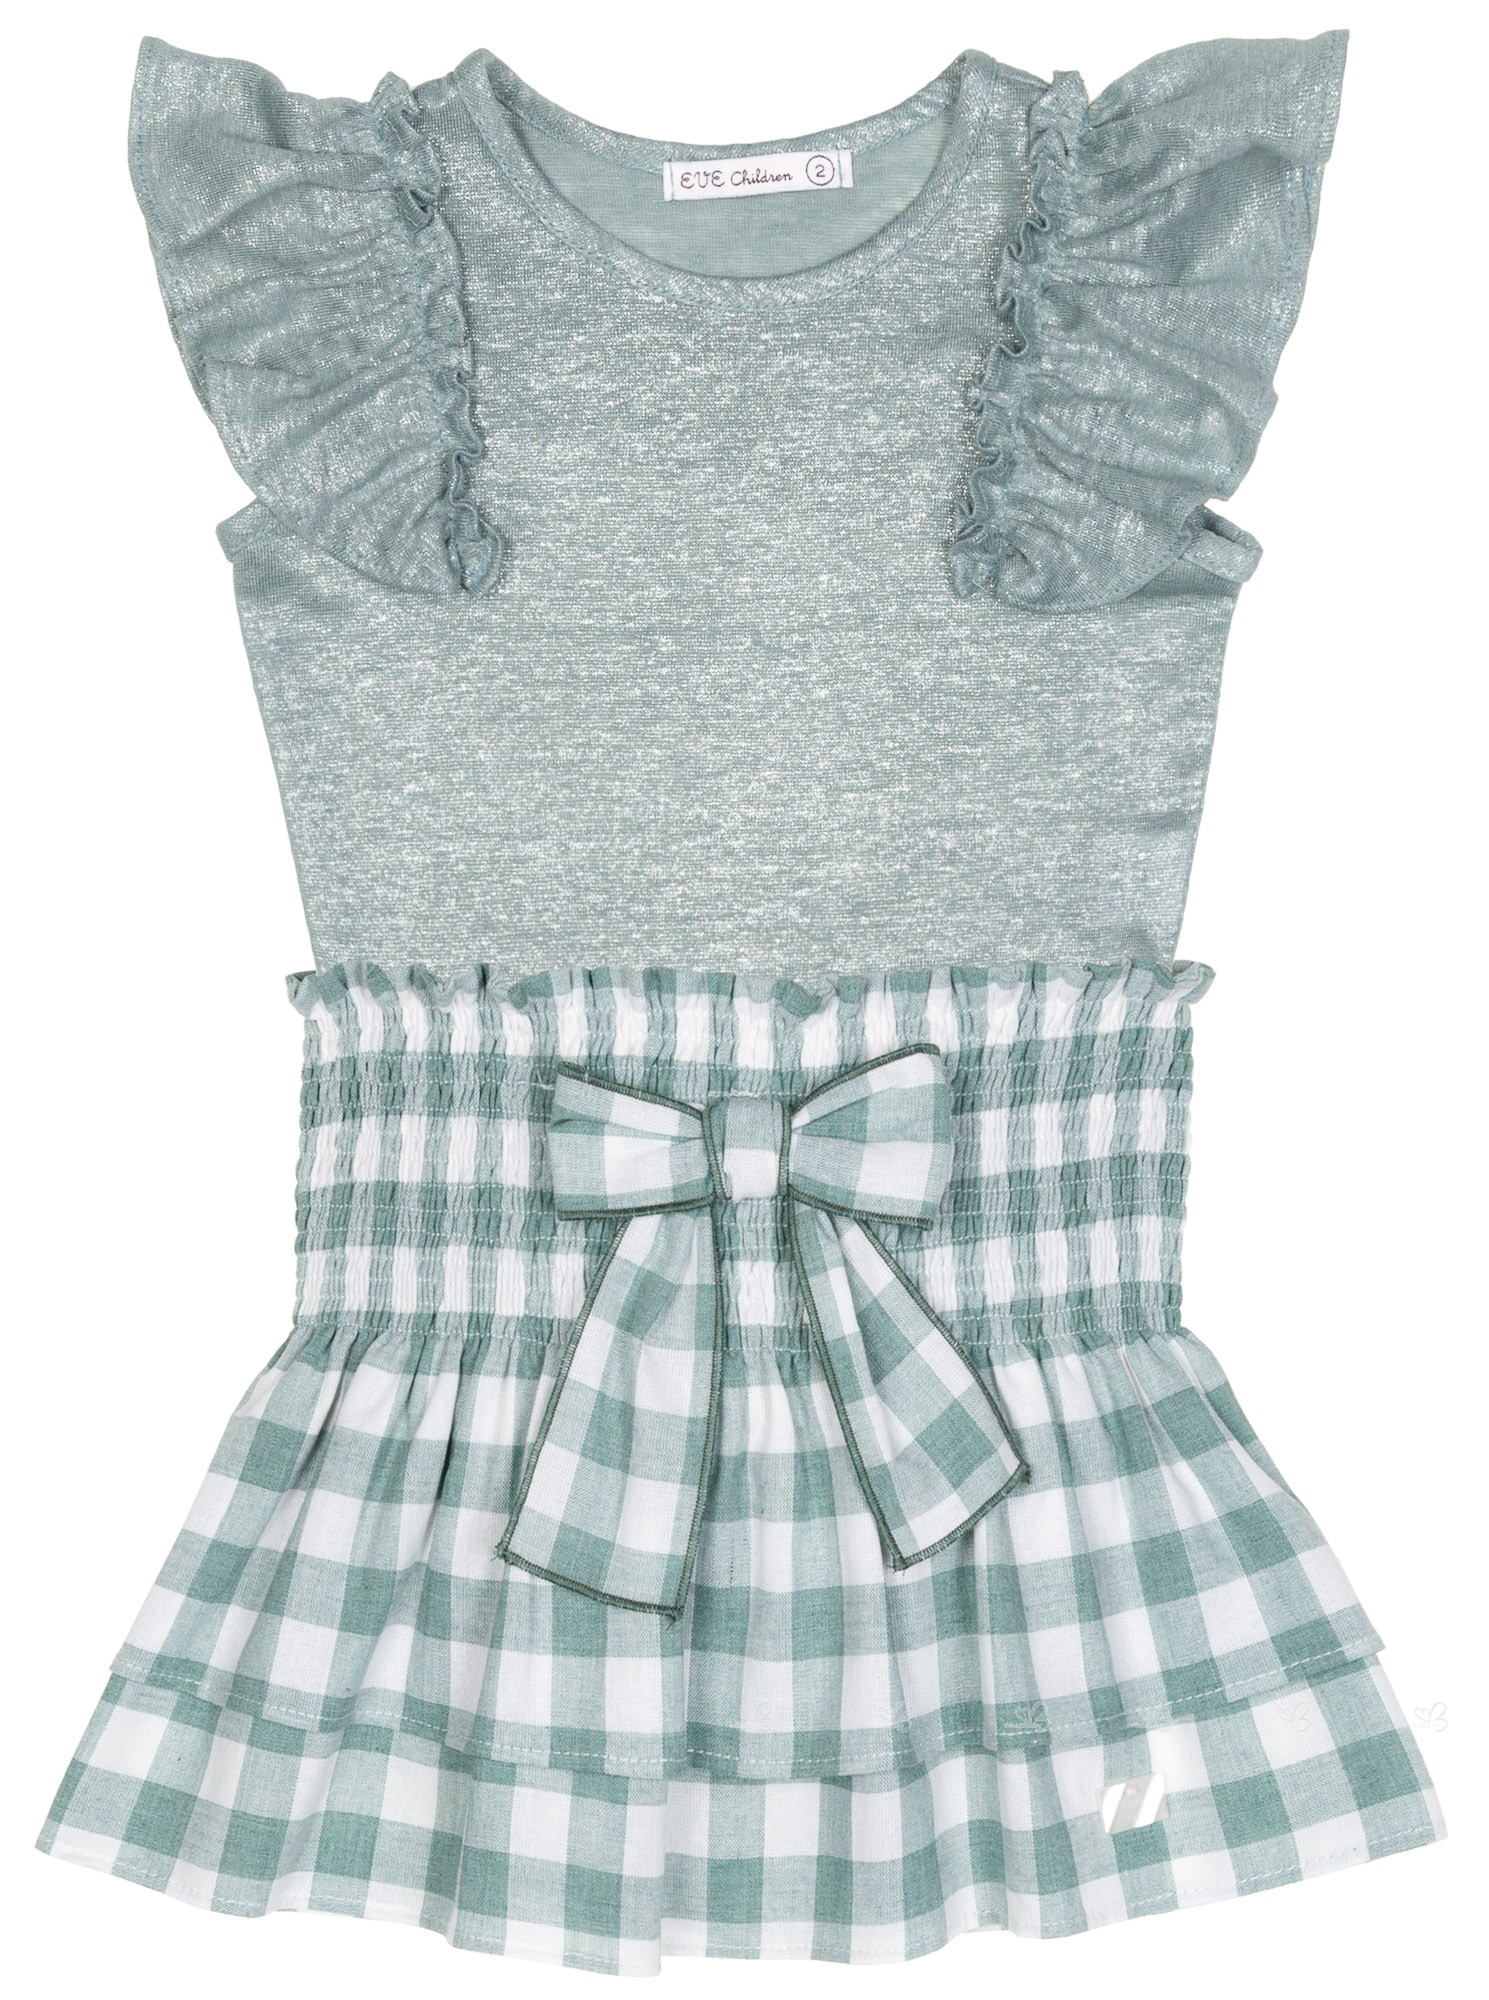 5ae98aaf8 Eve Children Girls Green Top   Gingham Skirt Set